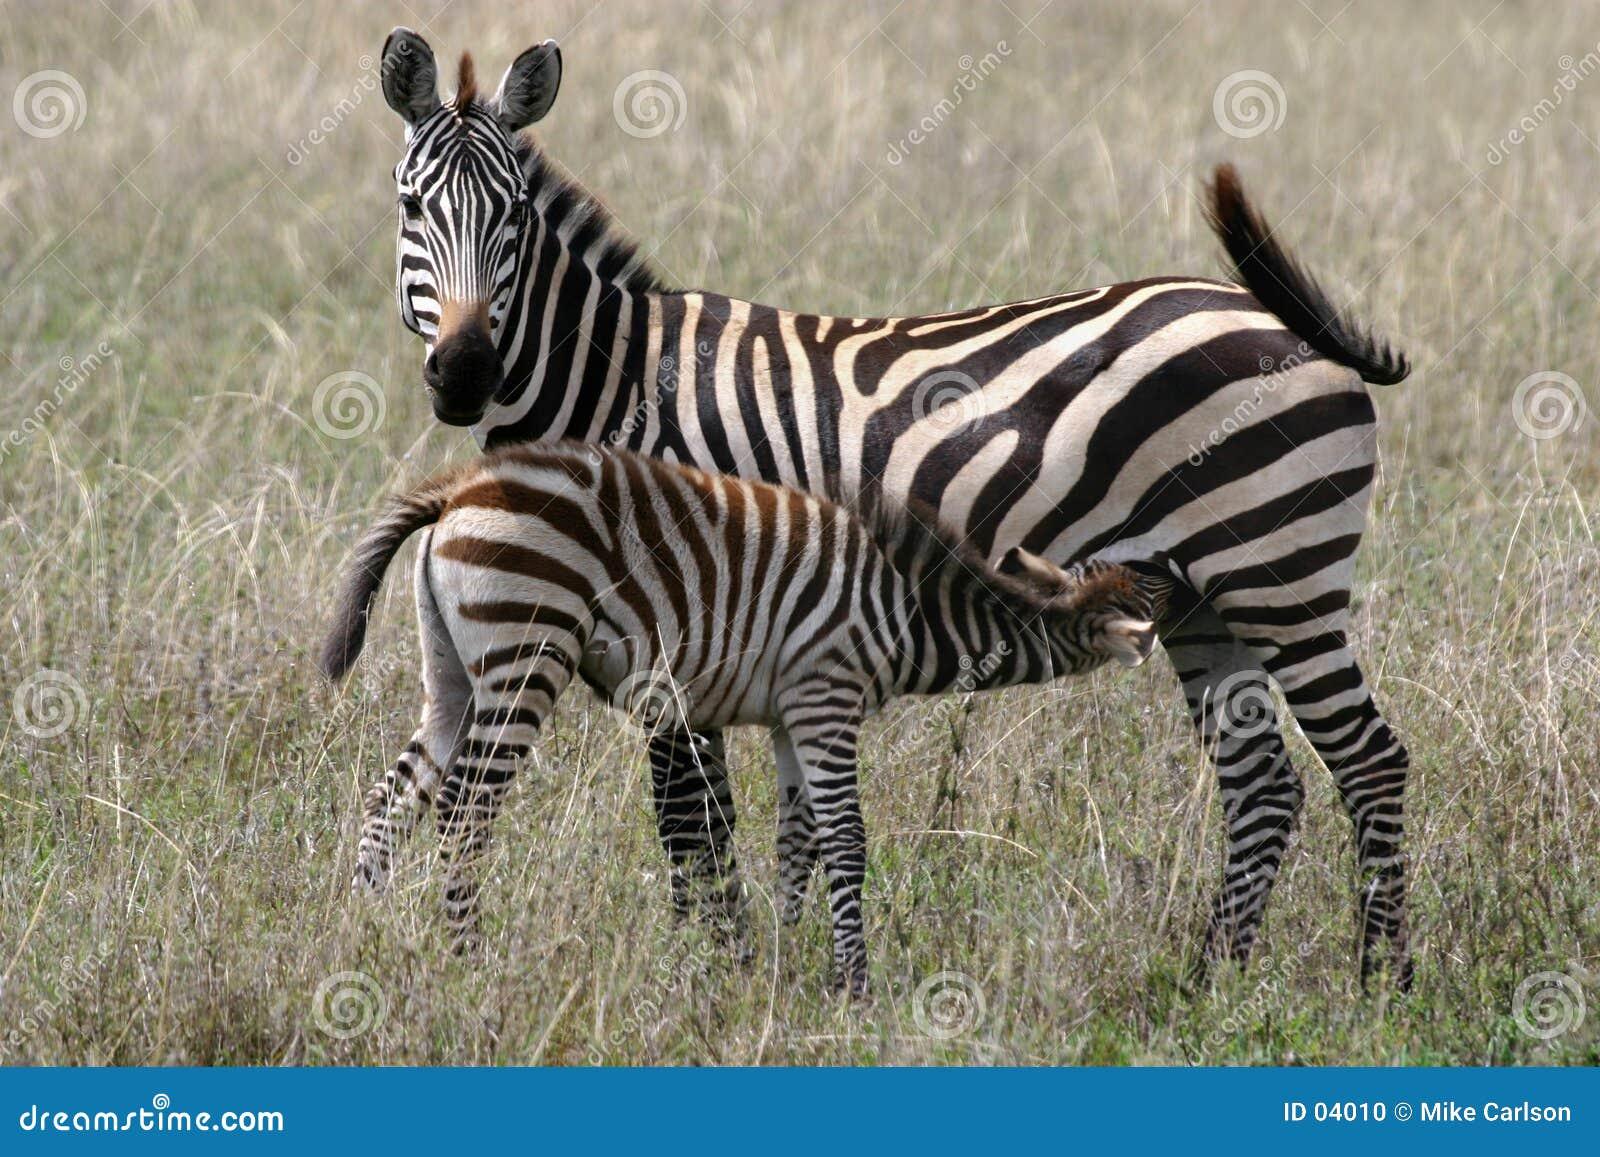 Zebra Feeding Time